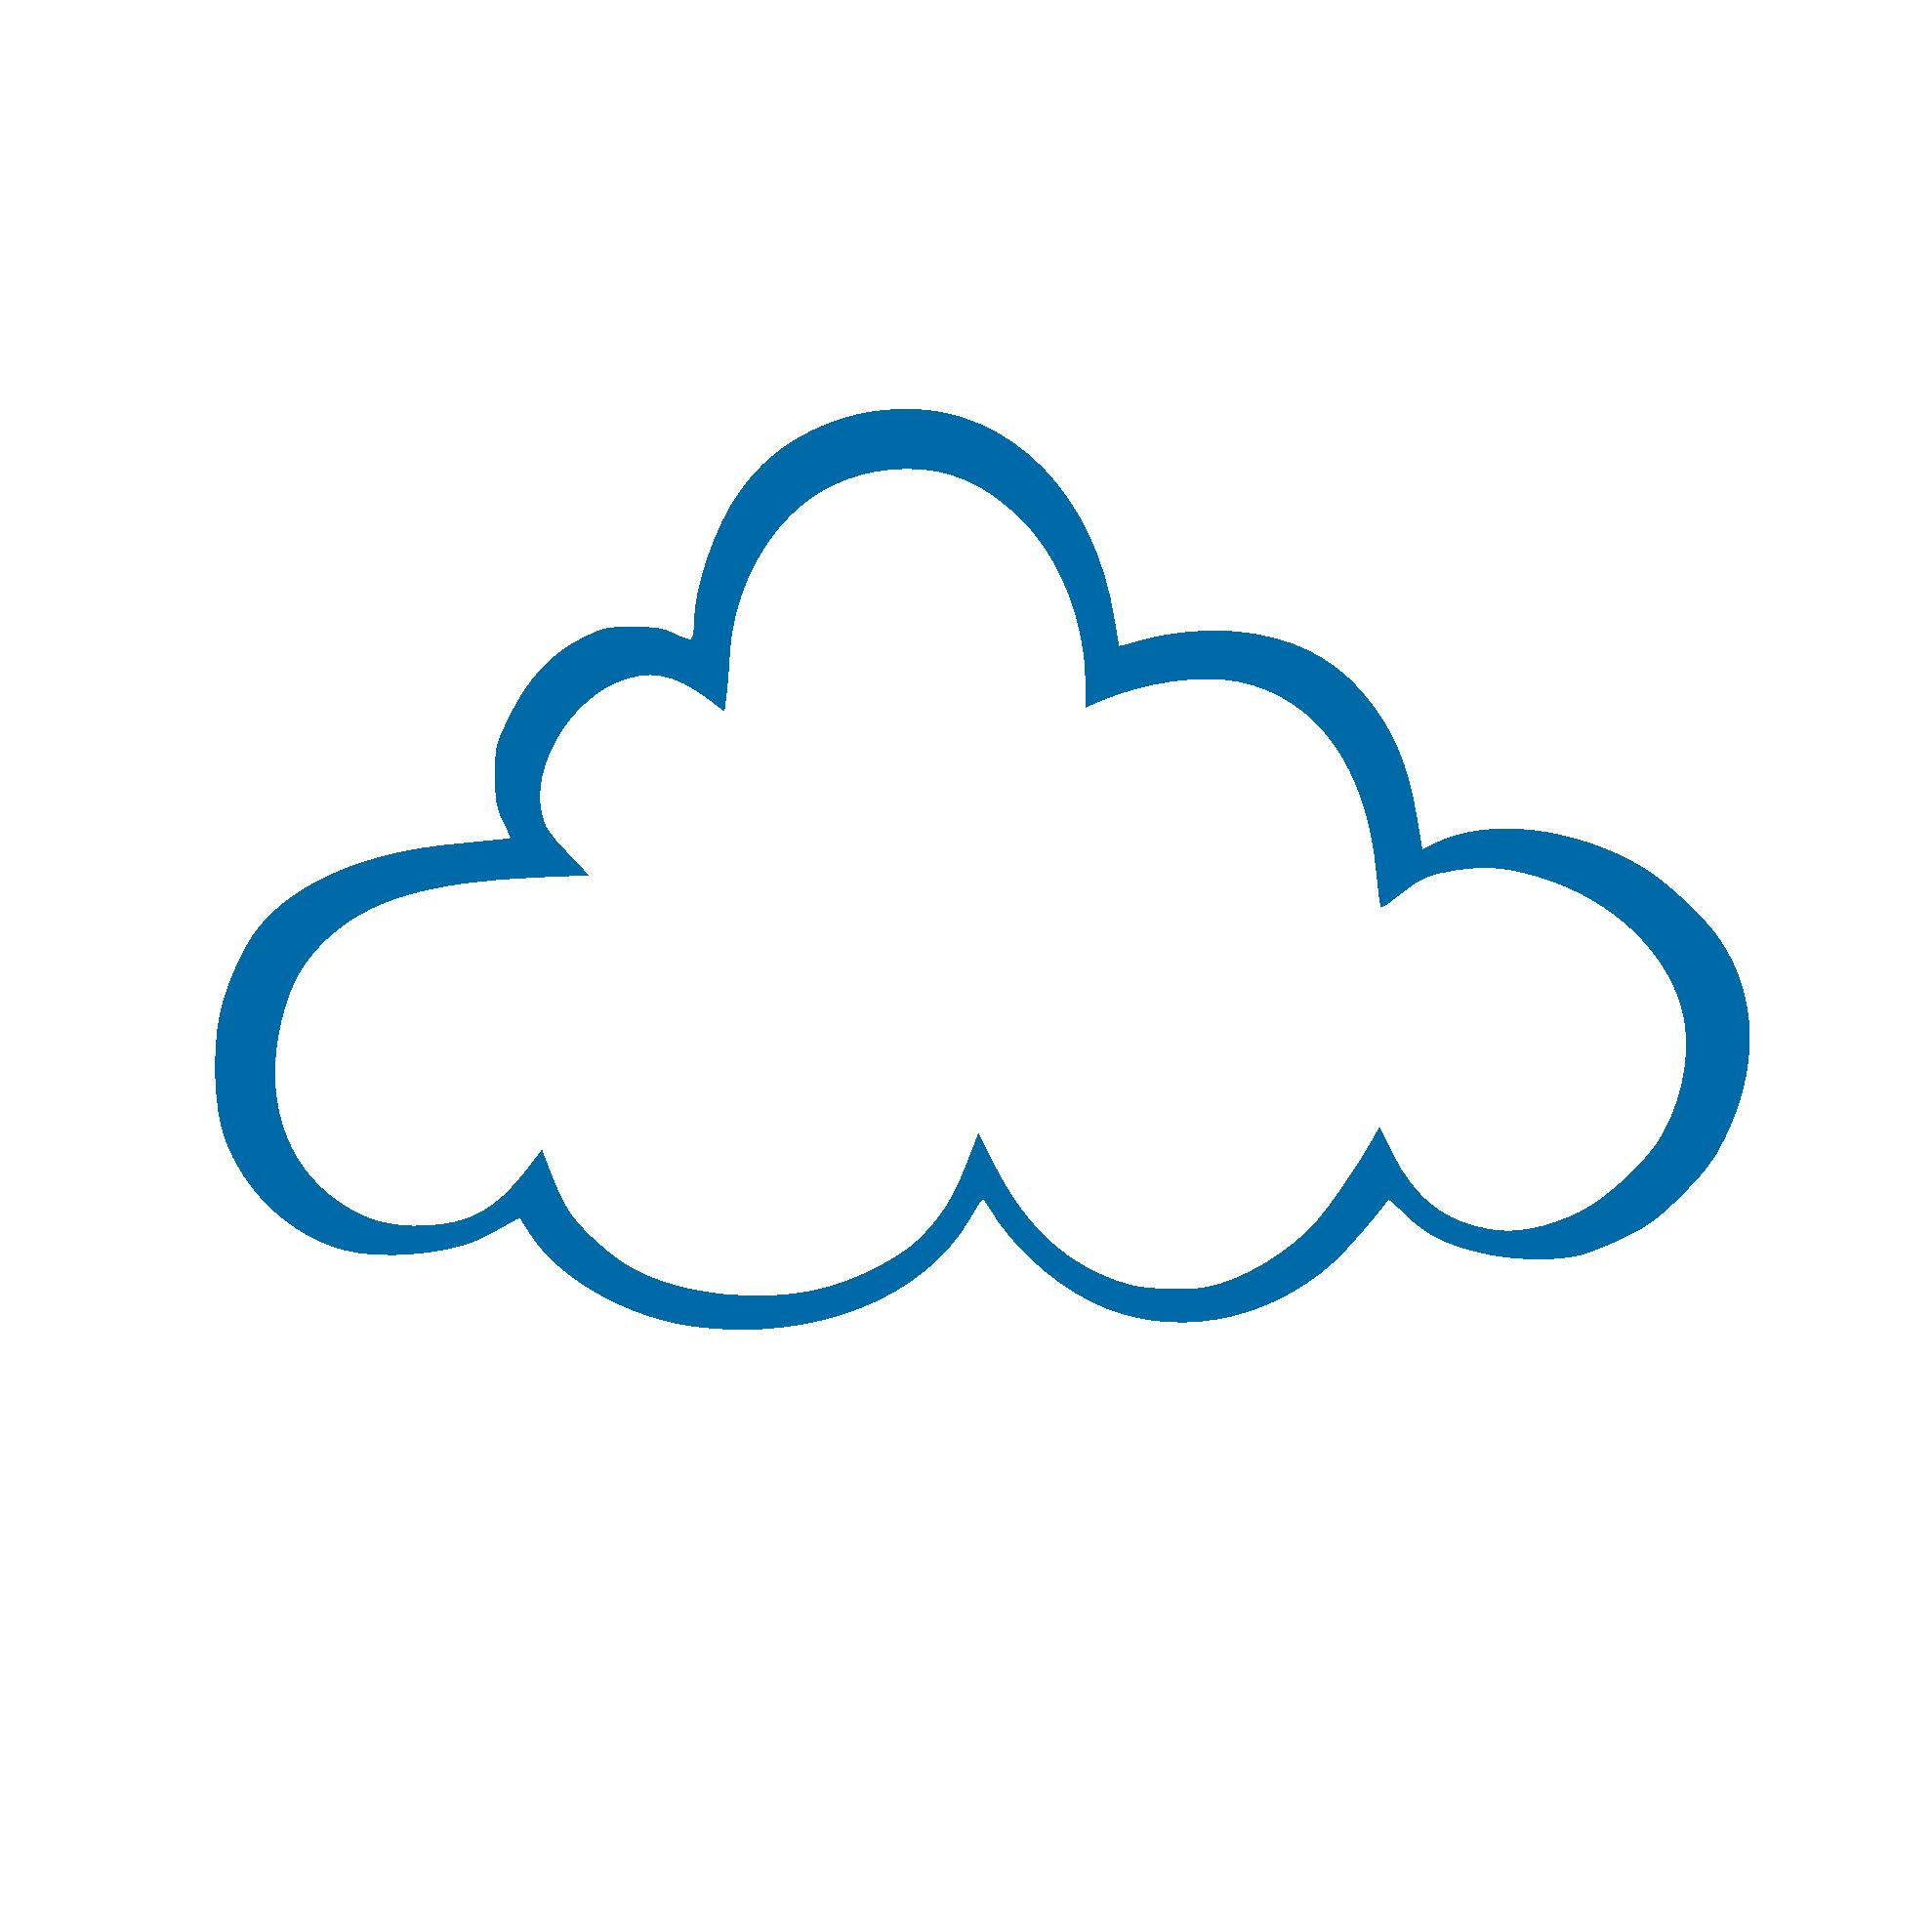 Google cloud logo clipart